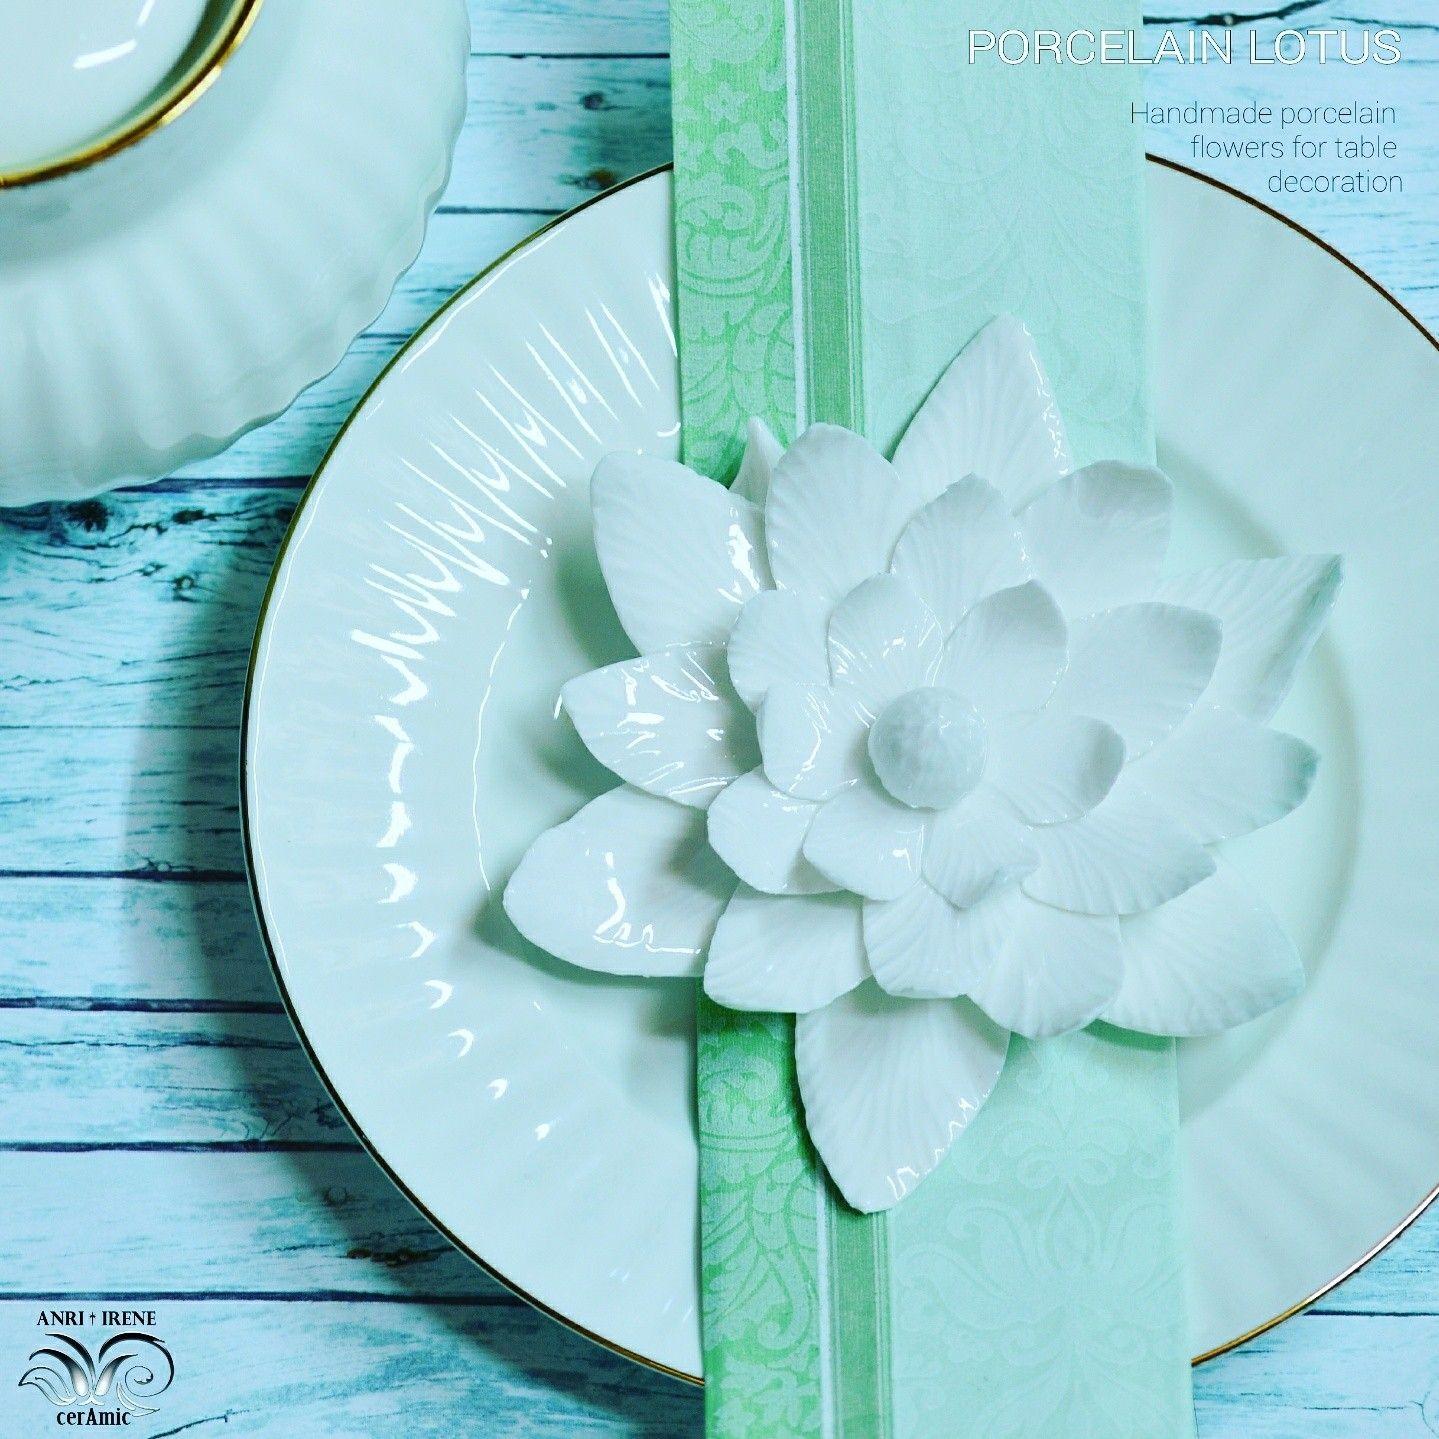 Porcelain lotus porcelain lily ceramic lotus floral ceramics porcelain lotus porcelain lily ceramic lotus floral ceramics white porcelain flower izmirmasajfo